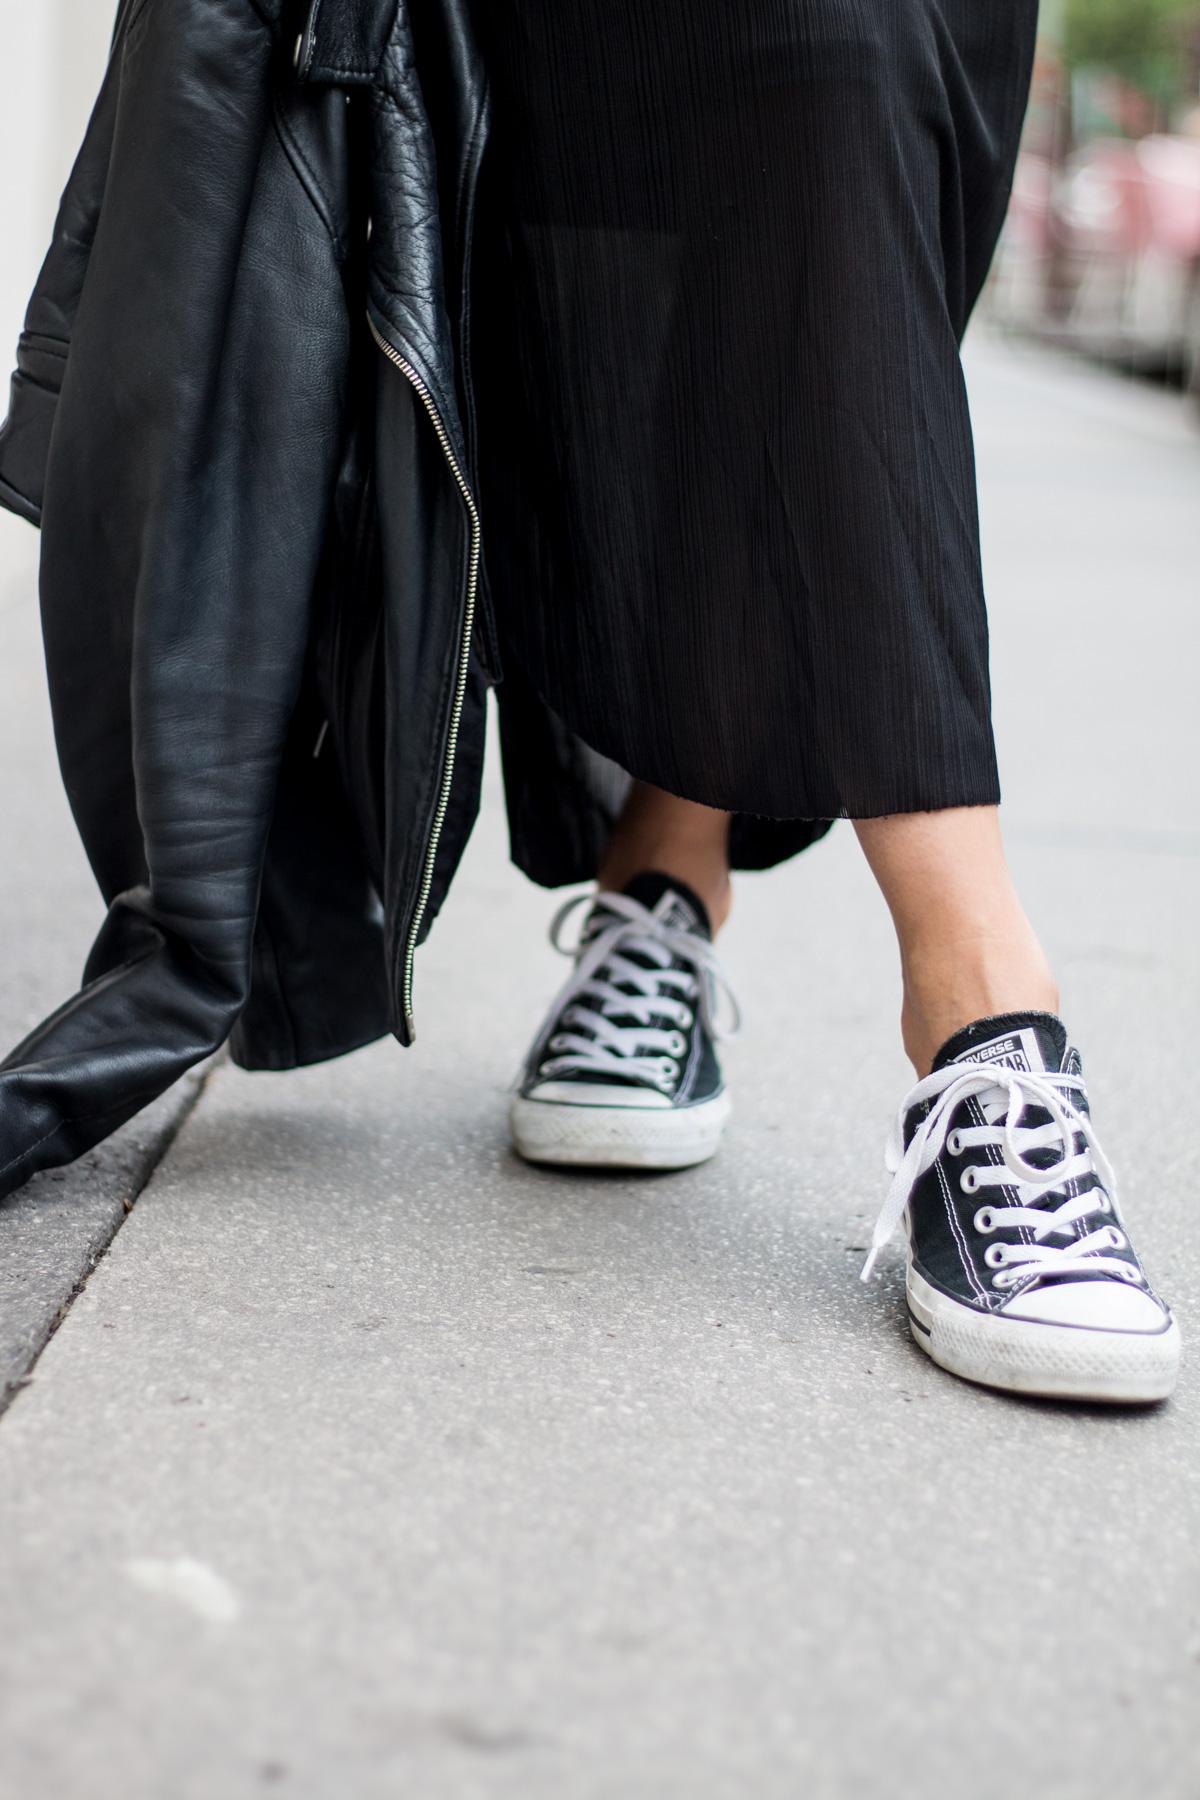 Editor's Pick: Slip Dresses | The Daily Dose